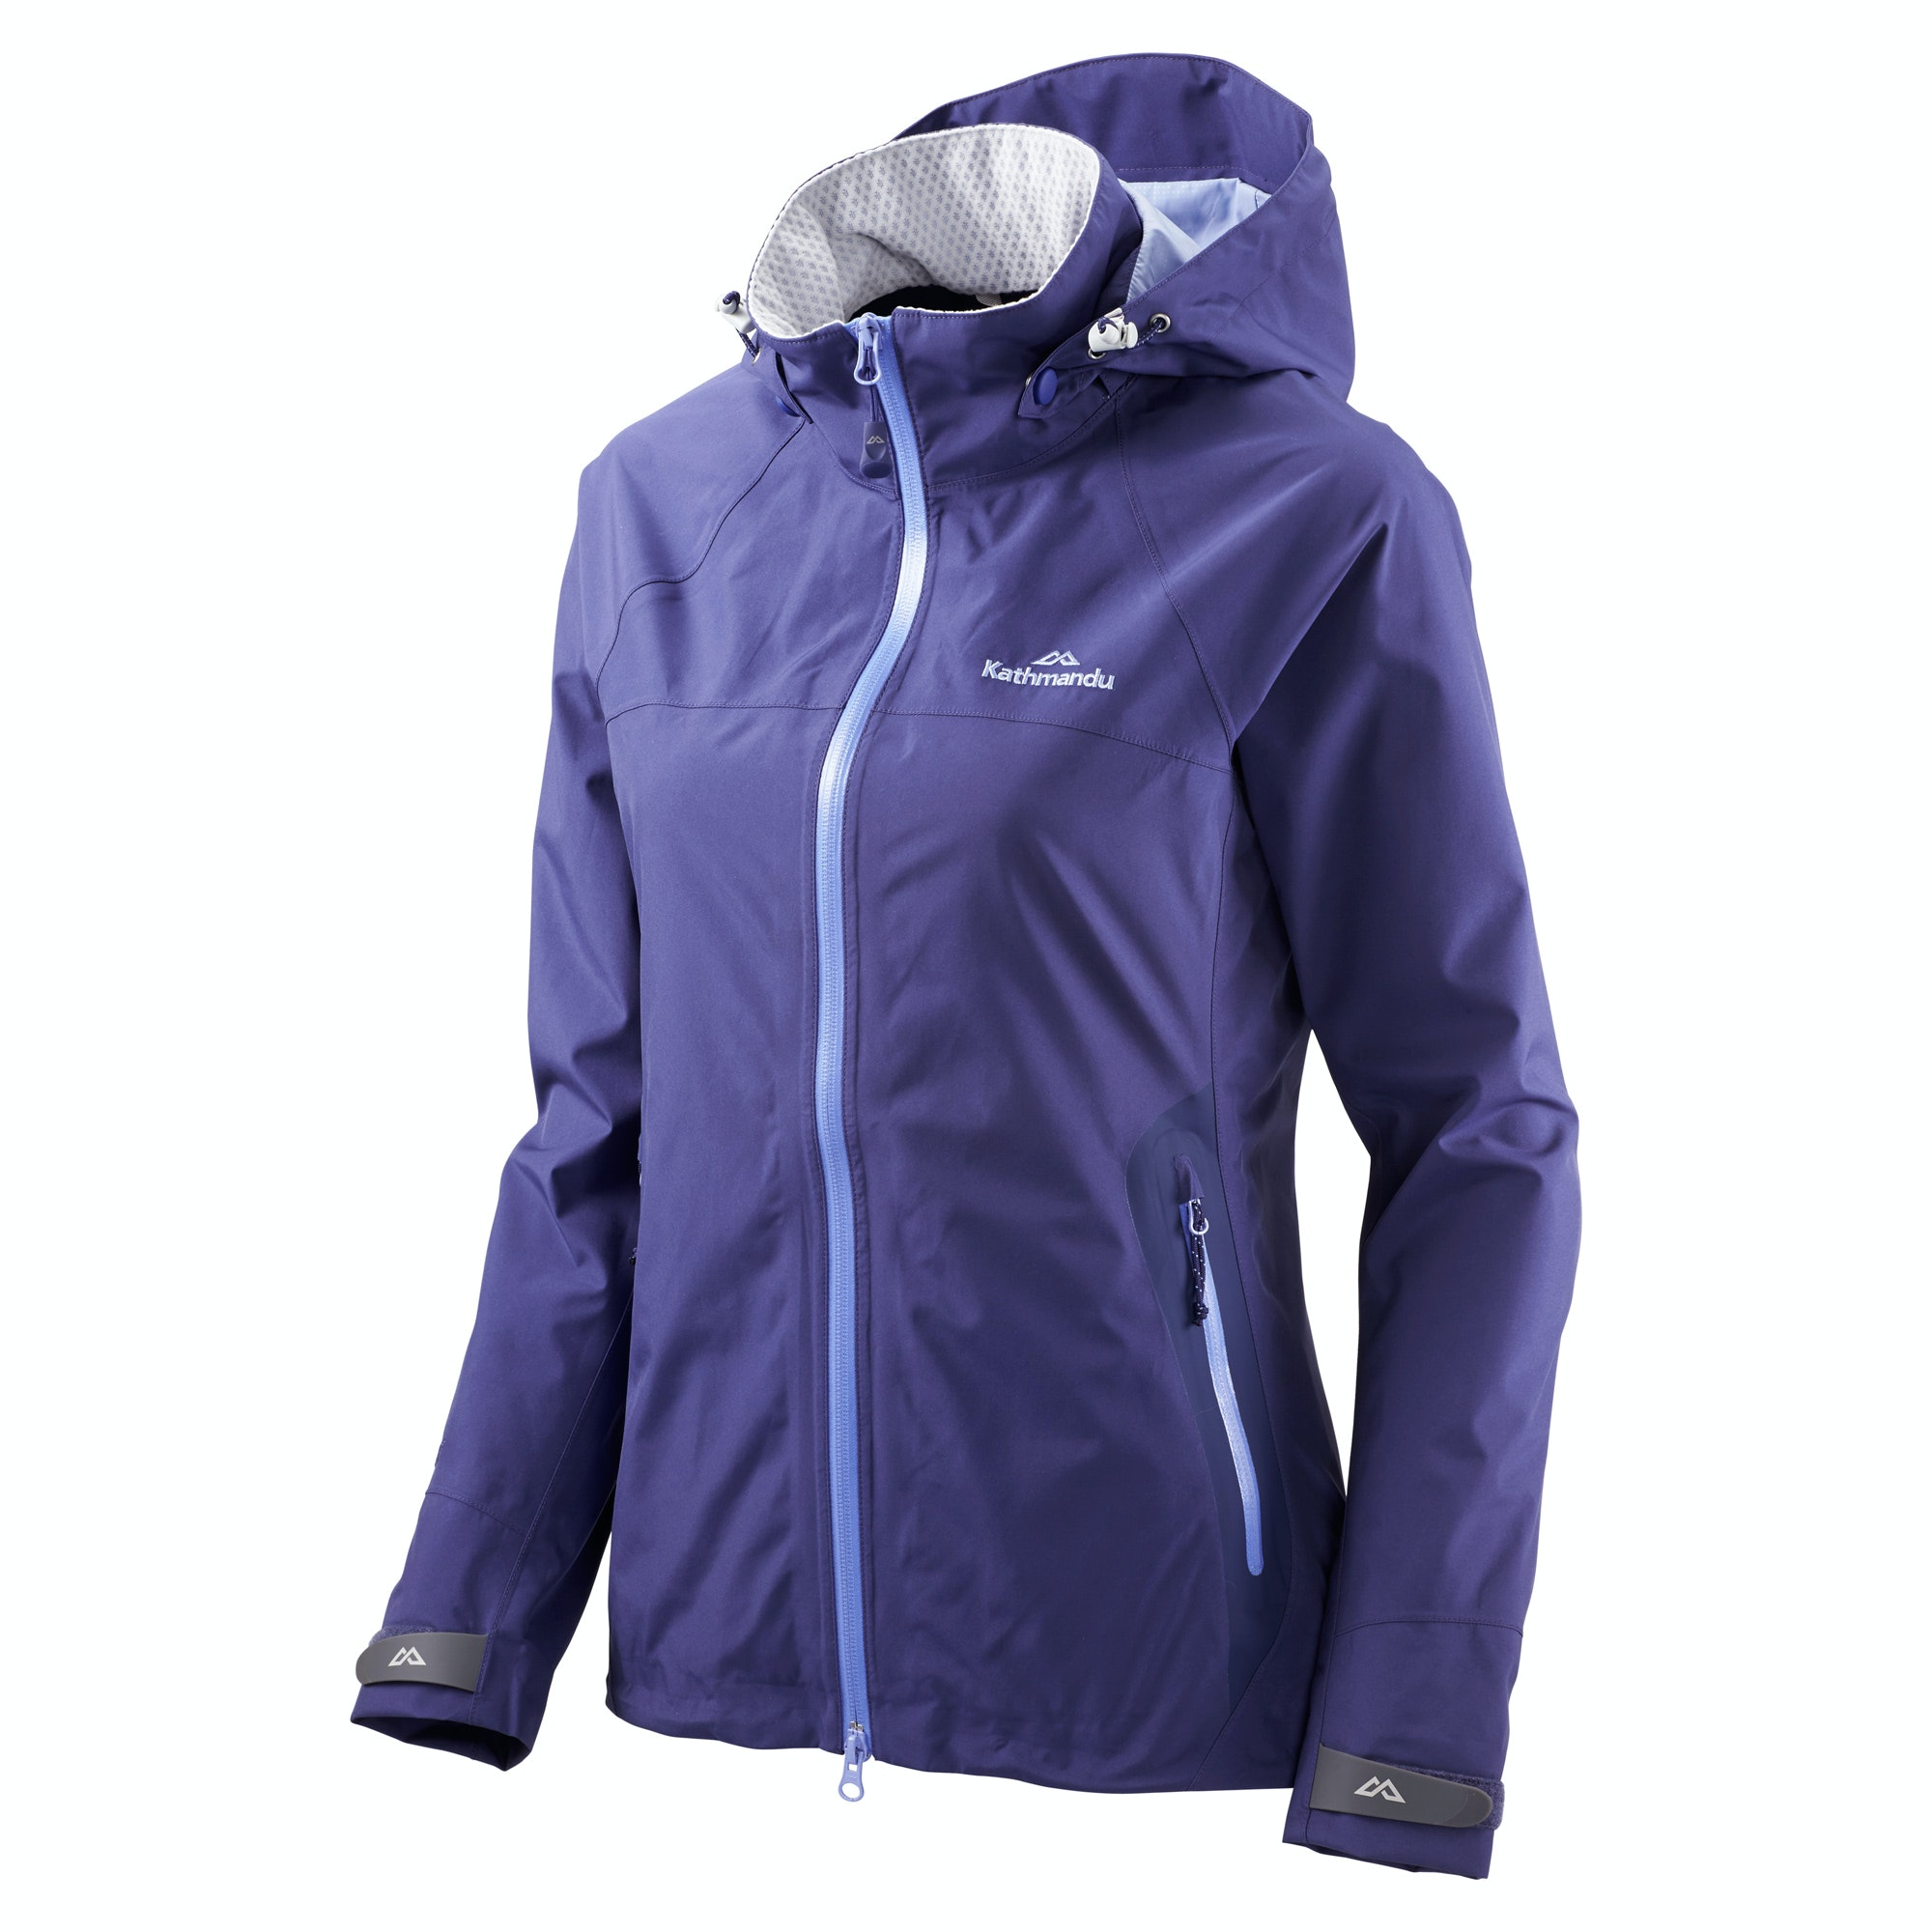 Womens goretex jacket